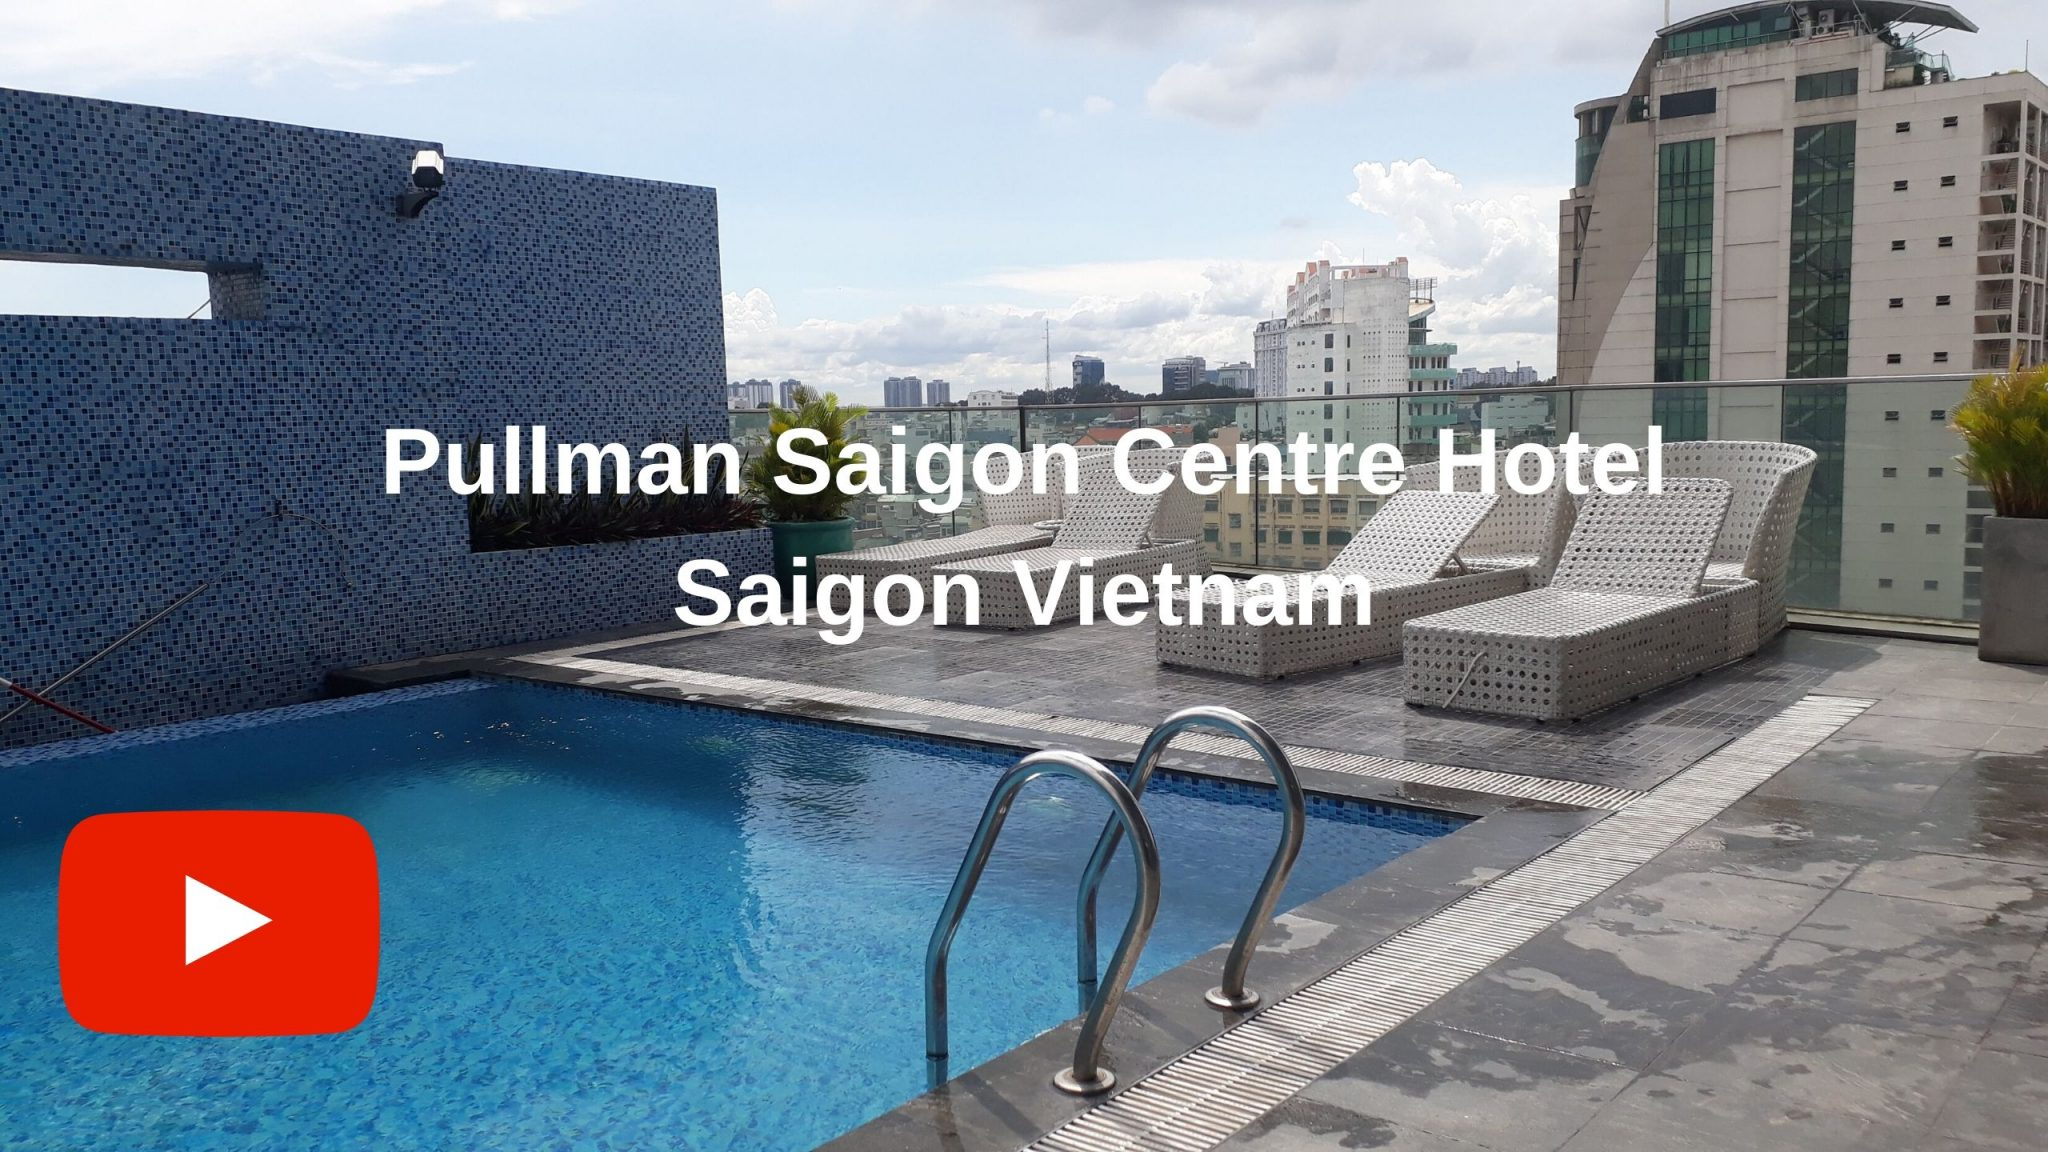 5 Days In Saigon Staying At The Pullman Saigon Centre Hotel